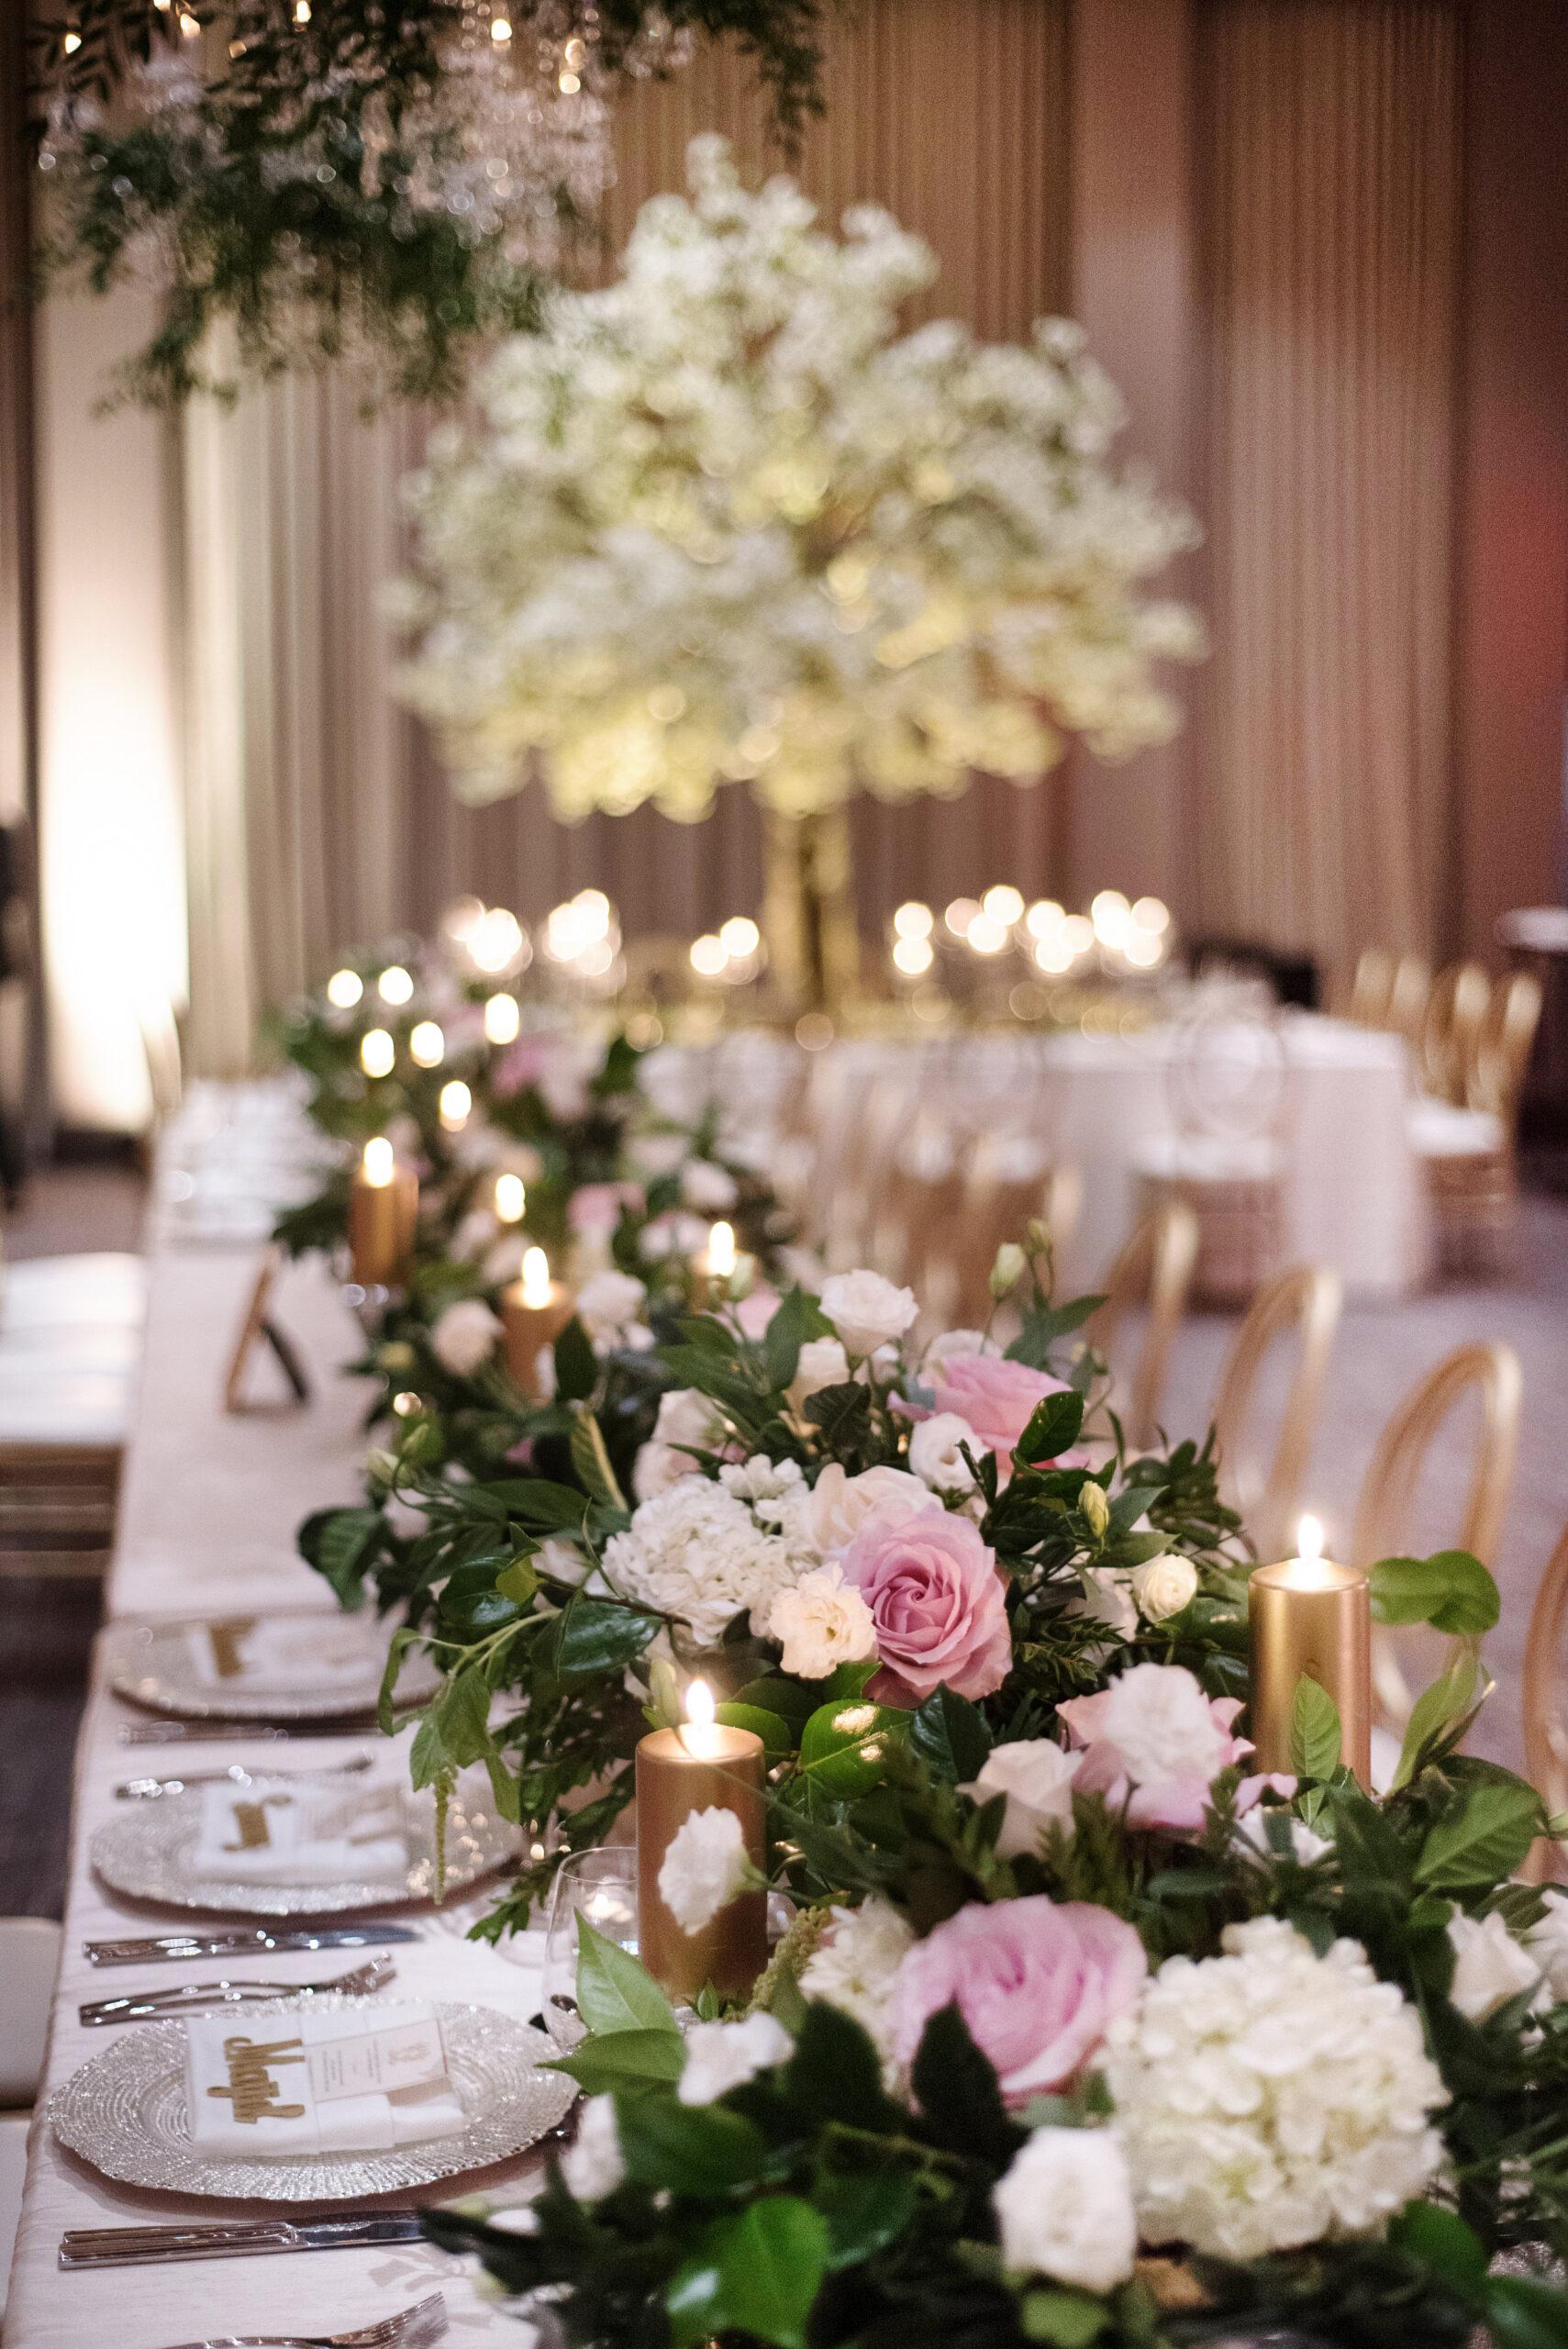 https://secureservercdn.net/45.40.145.151/kgq.ab5.myftpupload.com/wp-content/uploads/2020/04/Sanam-Soroush-s-Wedding-wedluxe-submission-0091-scaled.jpg?time=1606414923